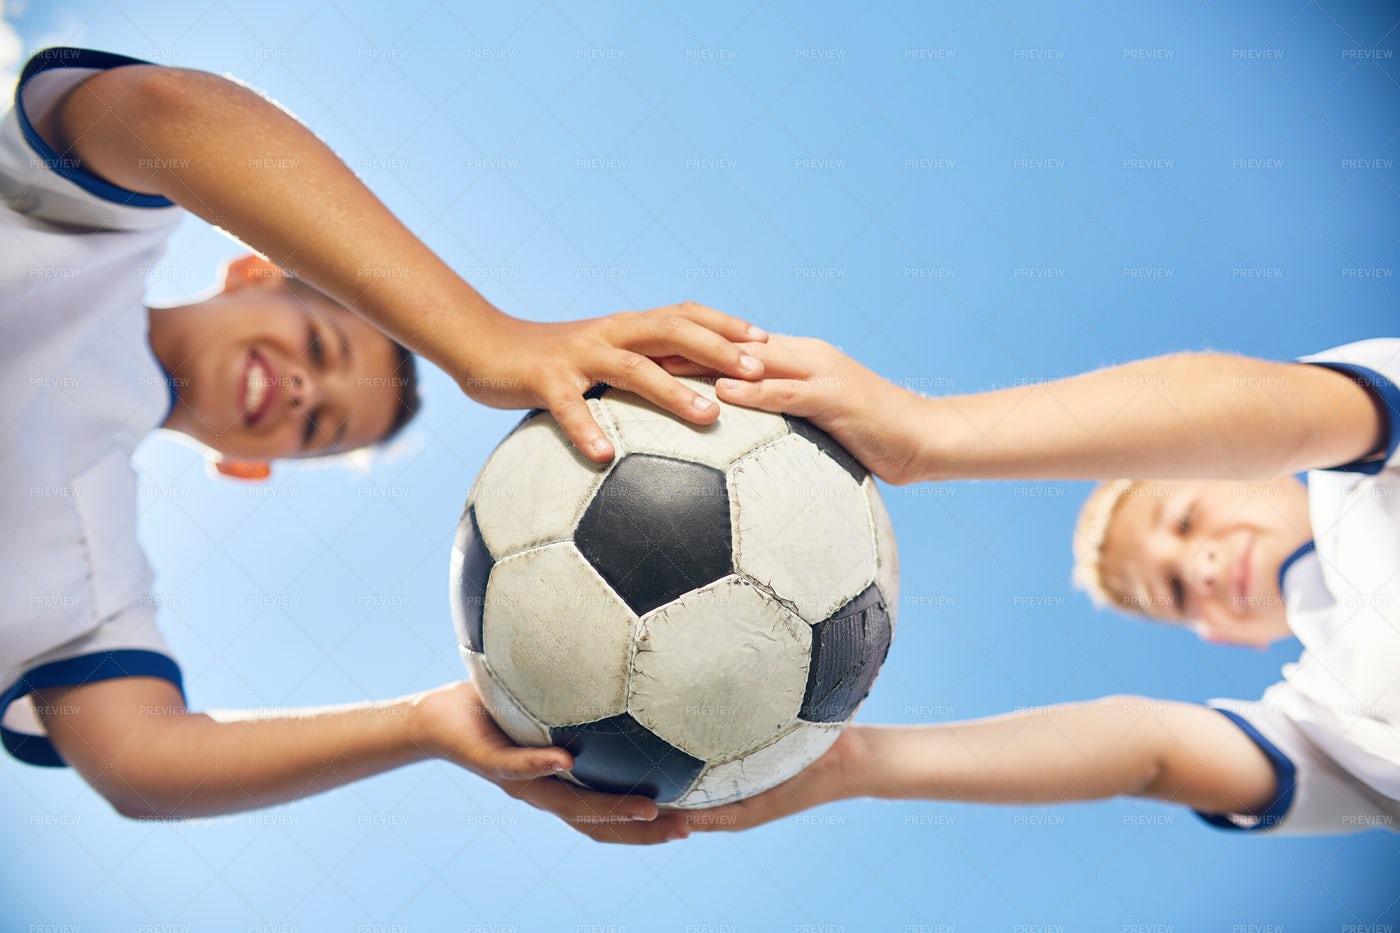 Two Boys Holding Football Ball: Stock Photos